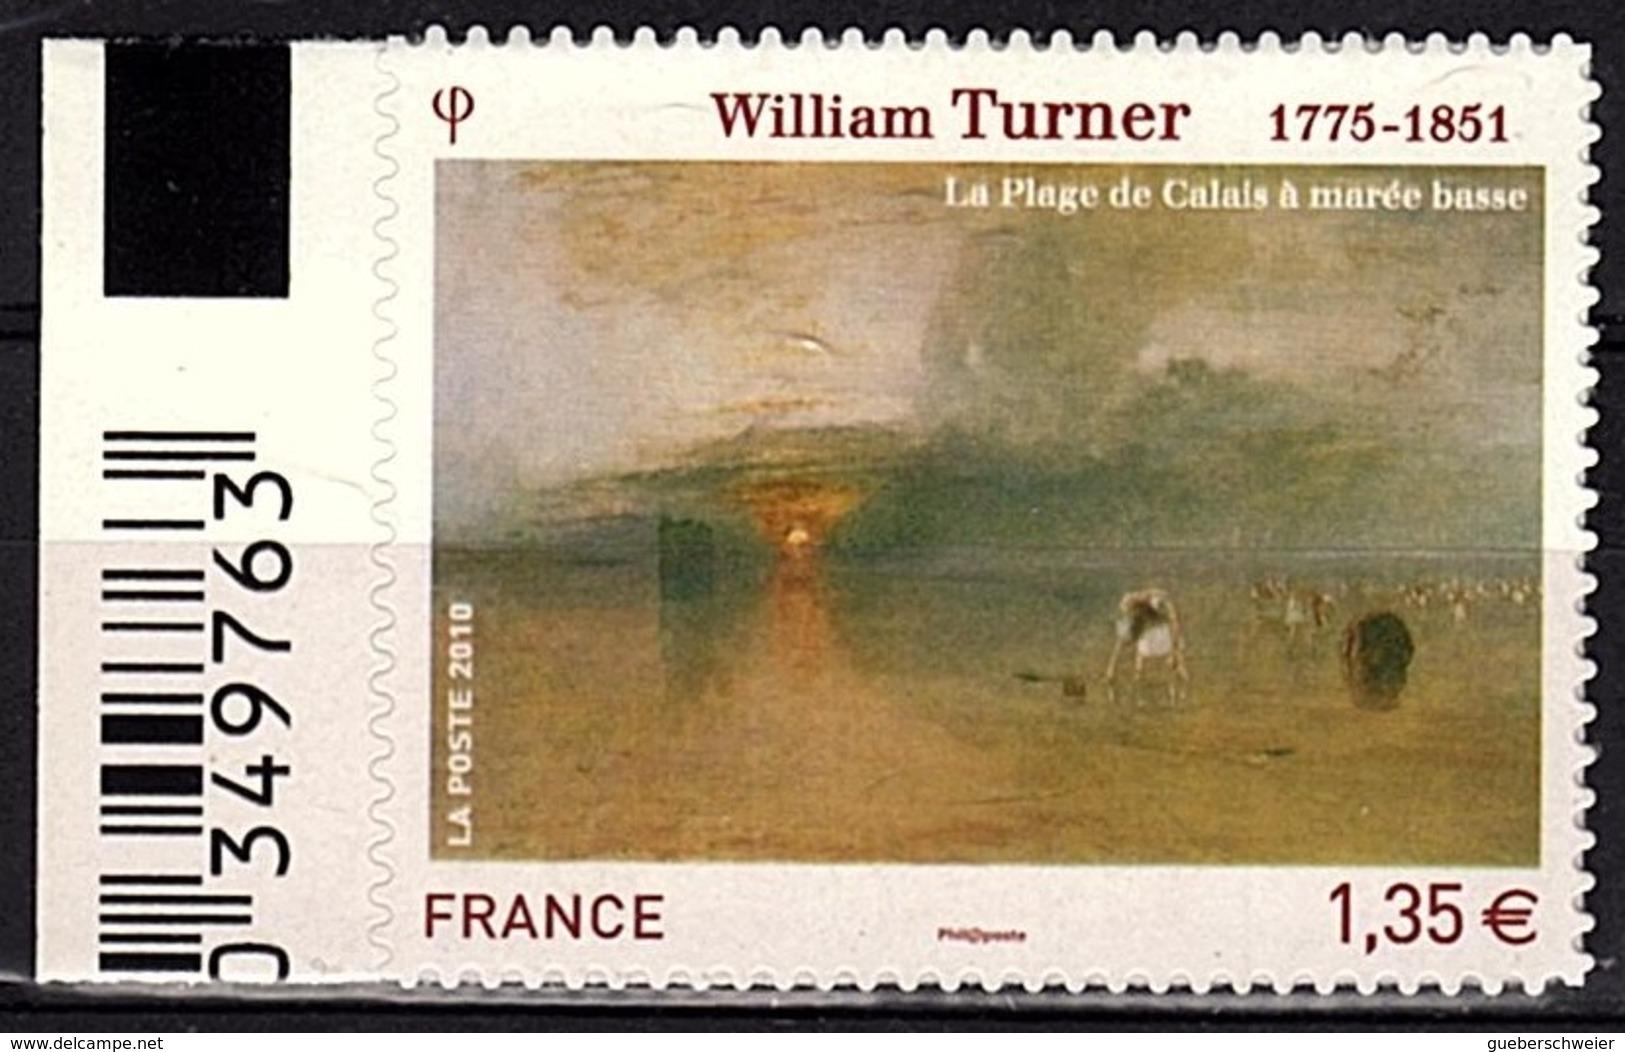 ADH 64 - FRANCE Adhésifs N° 402 Bord De Feuille Neuf** William Turner - Adhésifs (autocollants)